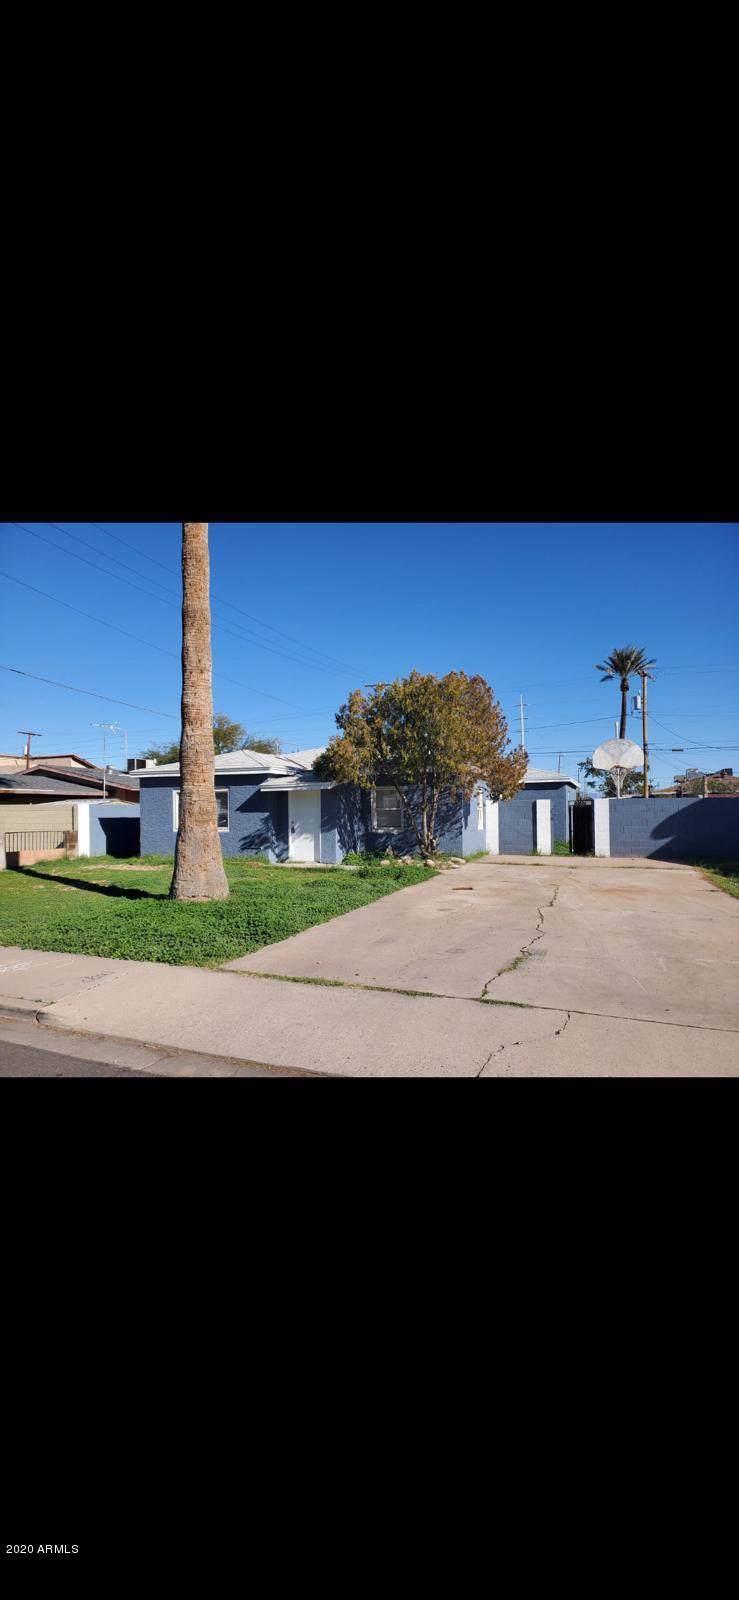 565 Drew Street - Photo 1